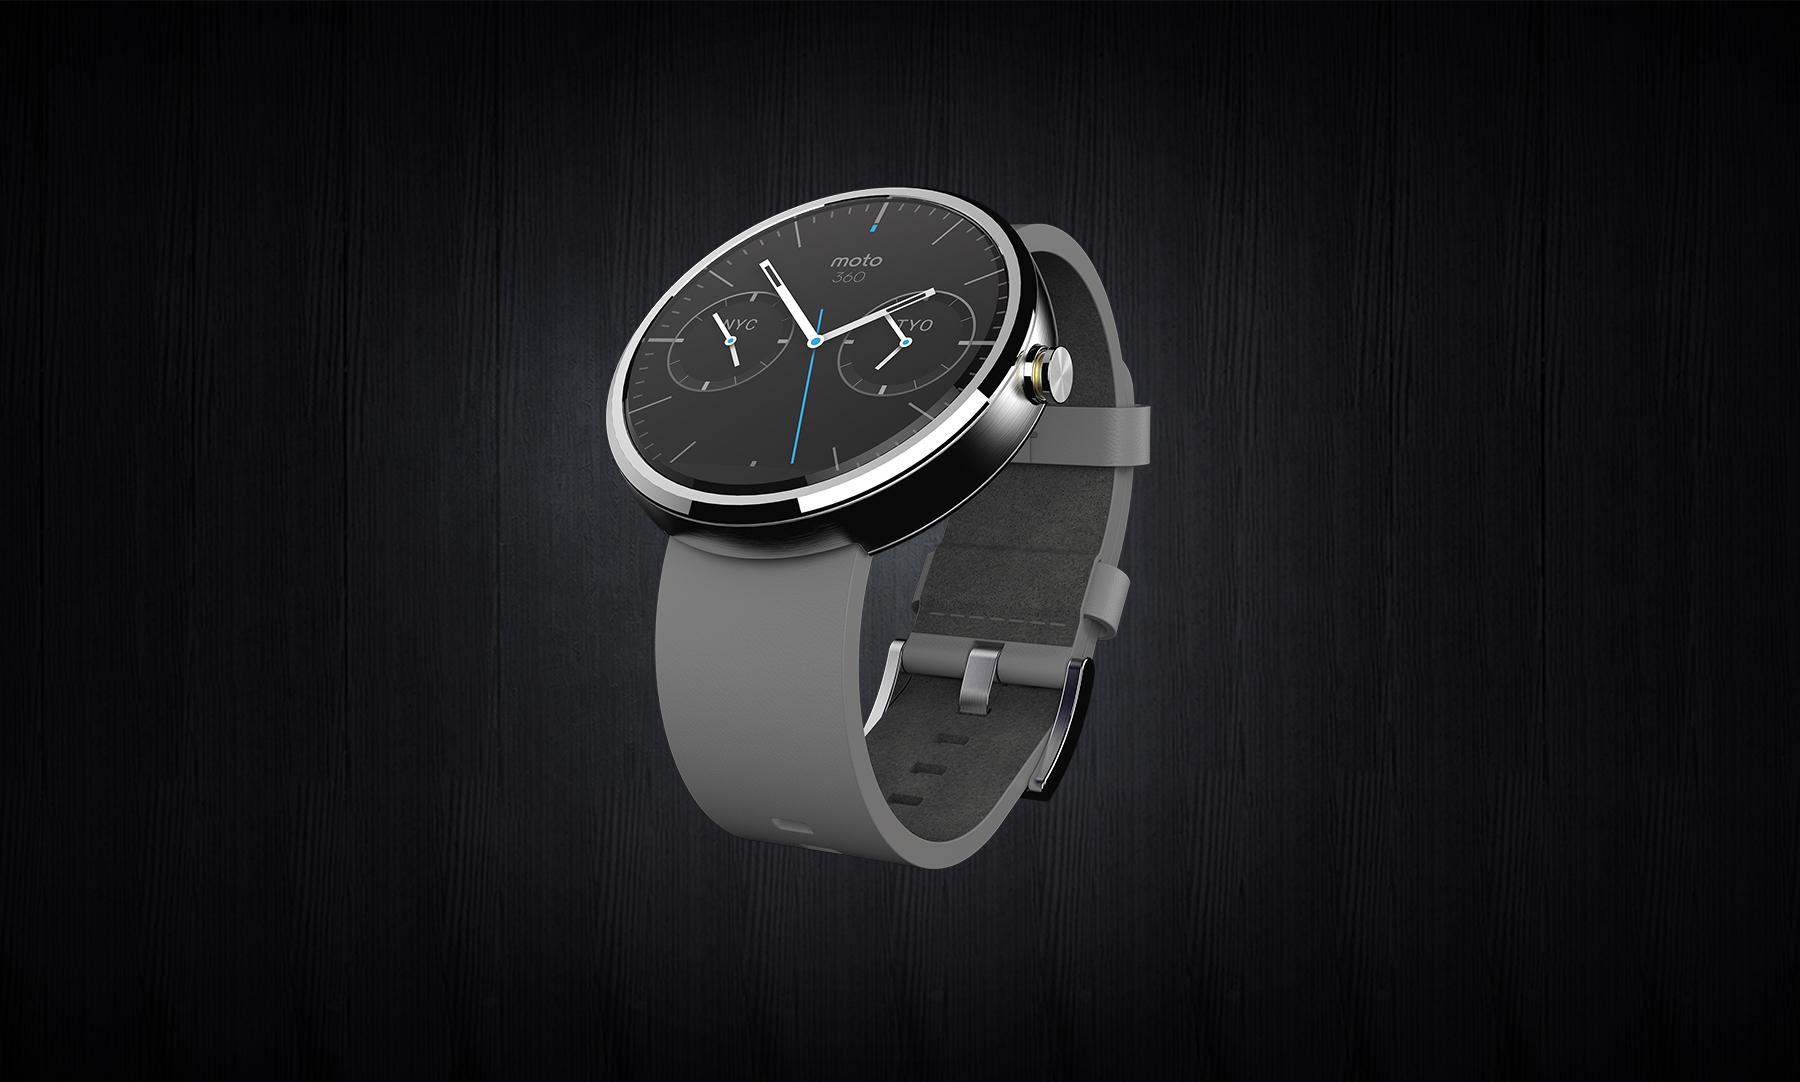 Moto360 Leather RGB - Meet the Moto 360; Motorola's First Smartwatch